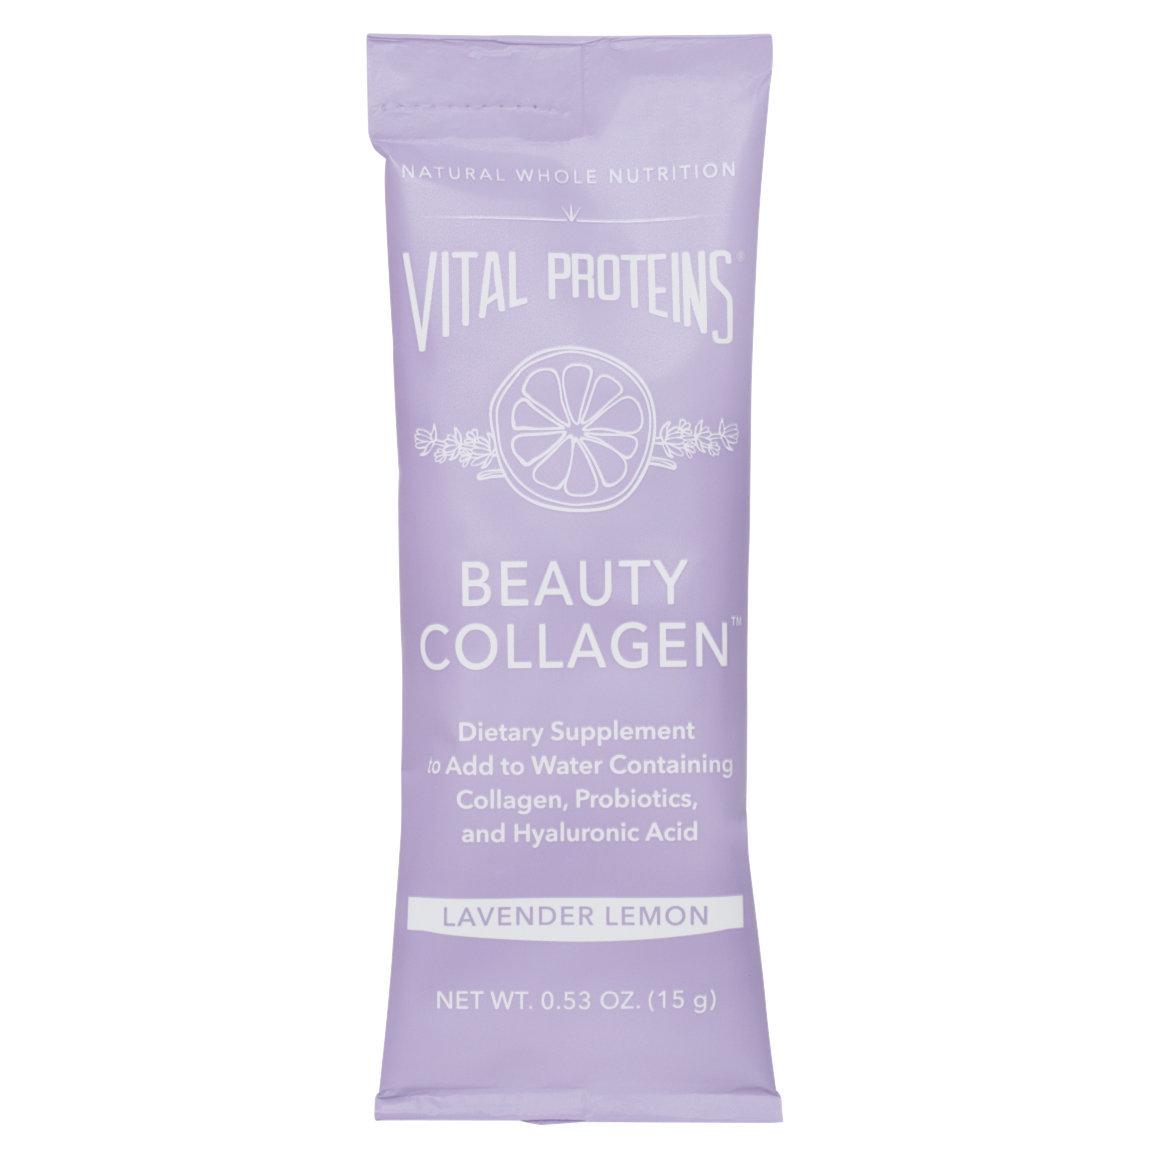 Vital Proteins Beauty Collagen - Lavender Lemon Stick Packs product swatch.